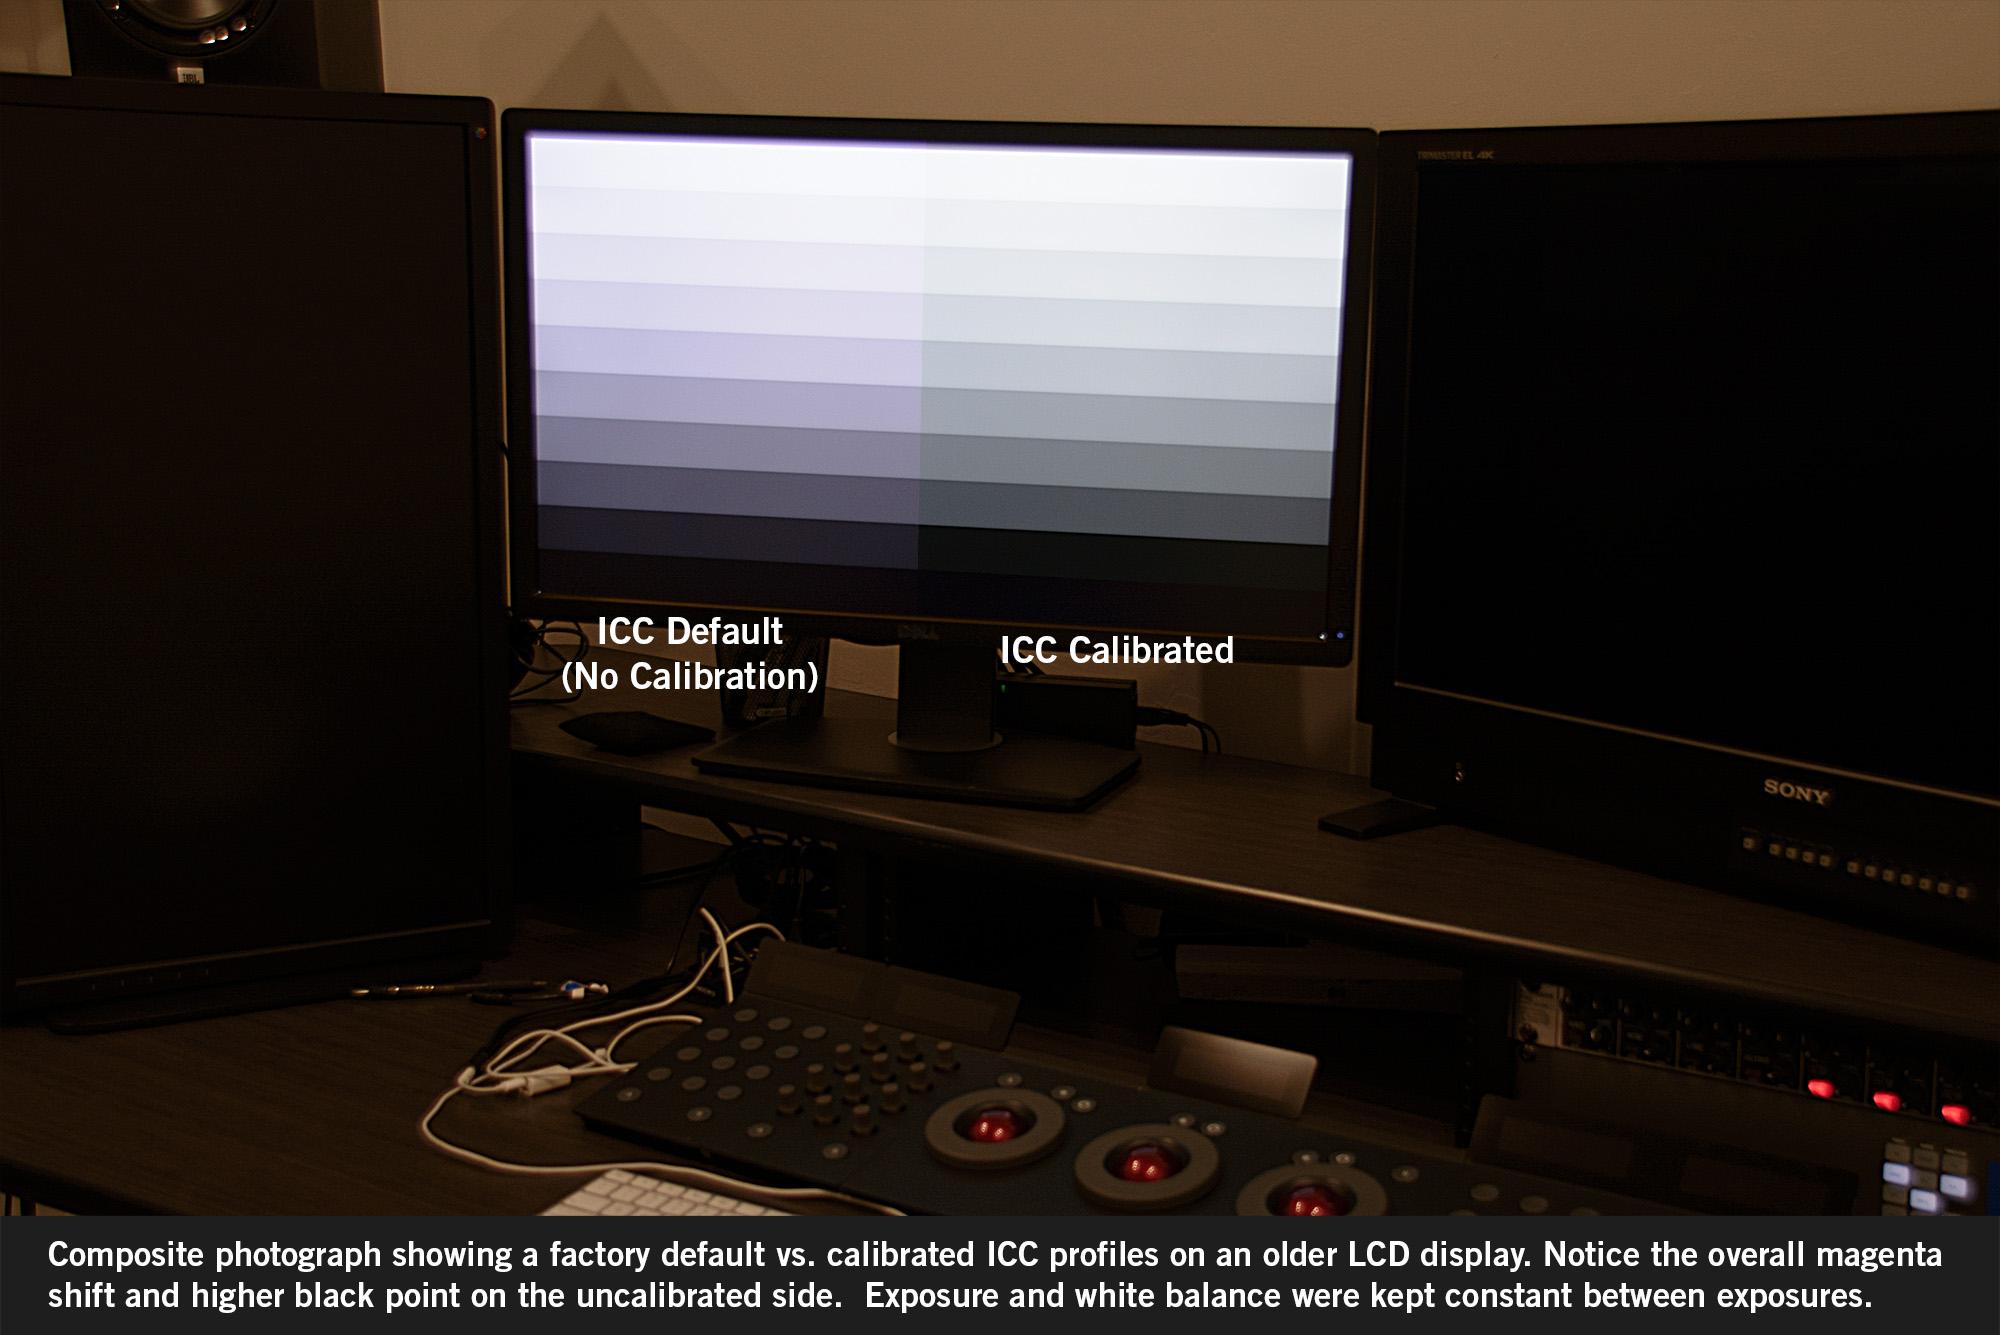 Factory Default ICC vs Calibrated ICC Composite Image